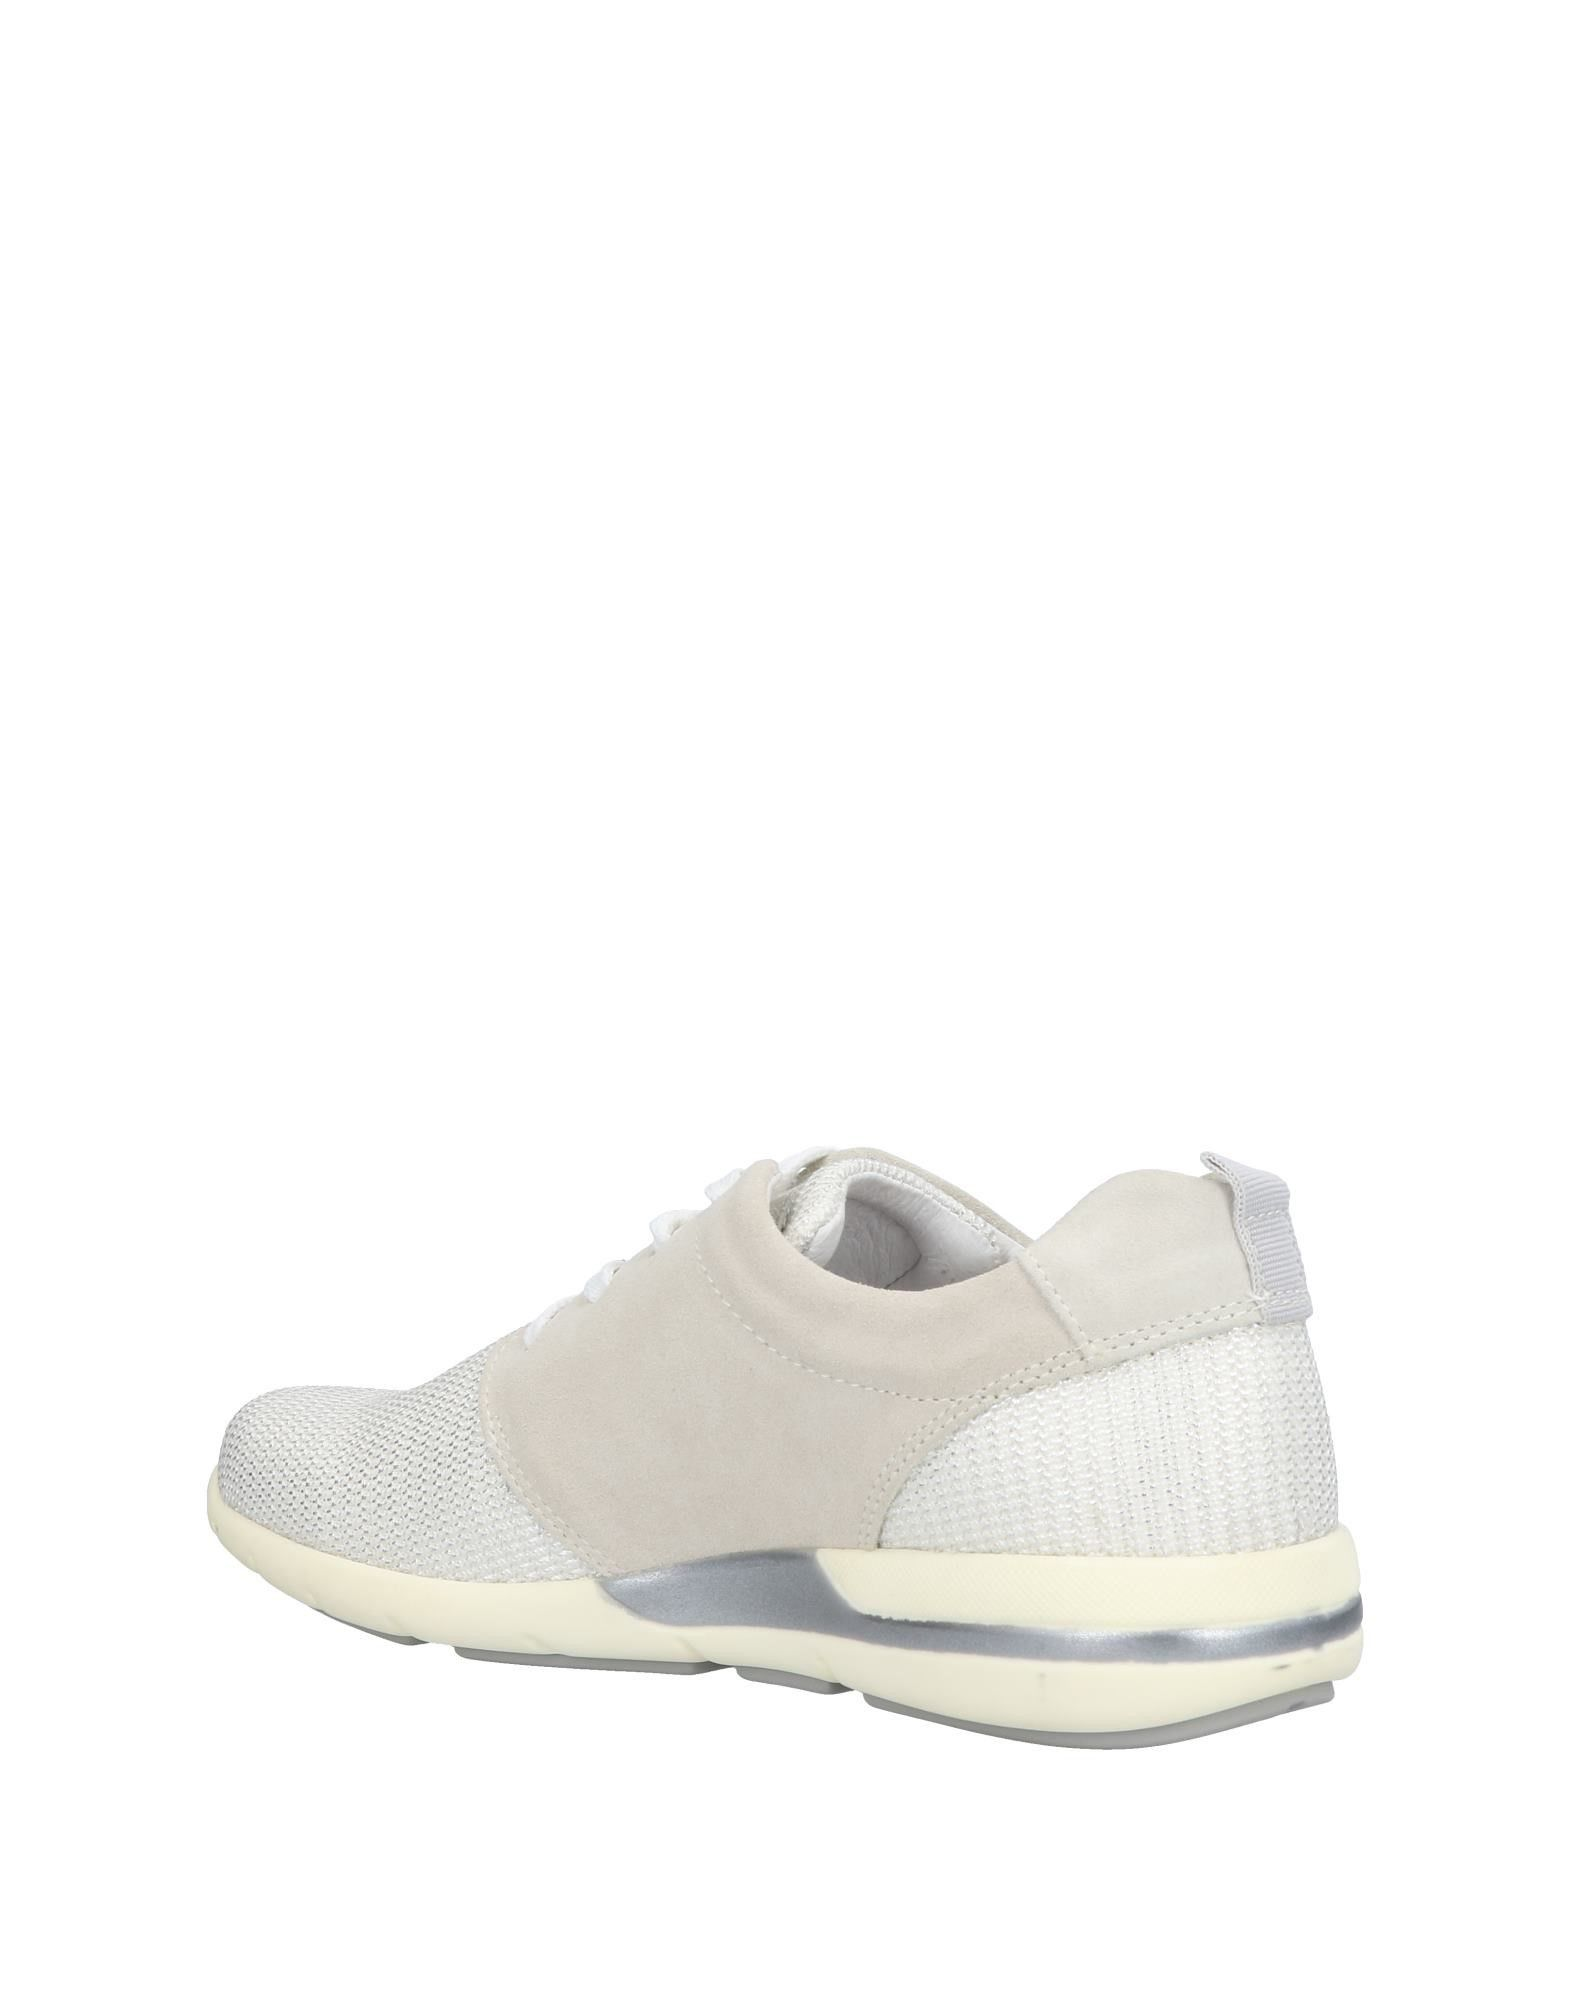 Igi&Co Sneakers Damen  11464036WE Gute Qualität beliebte Schuhe Schuhe Schuhe 61f718